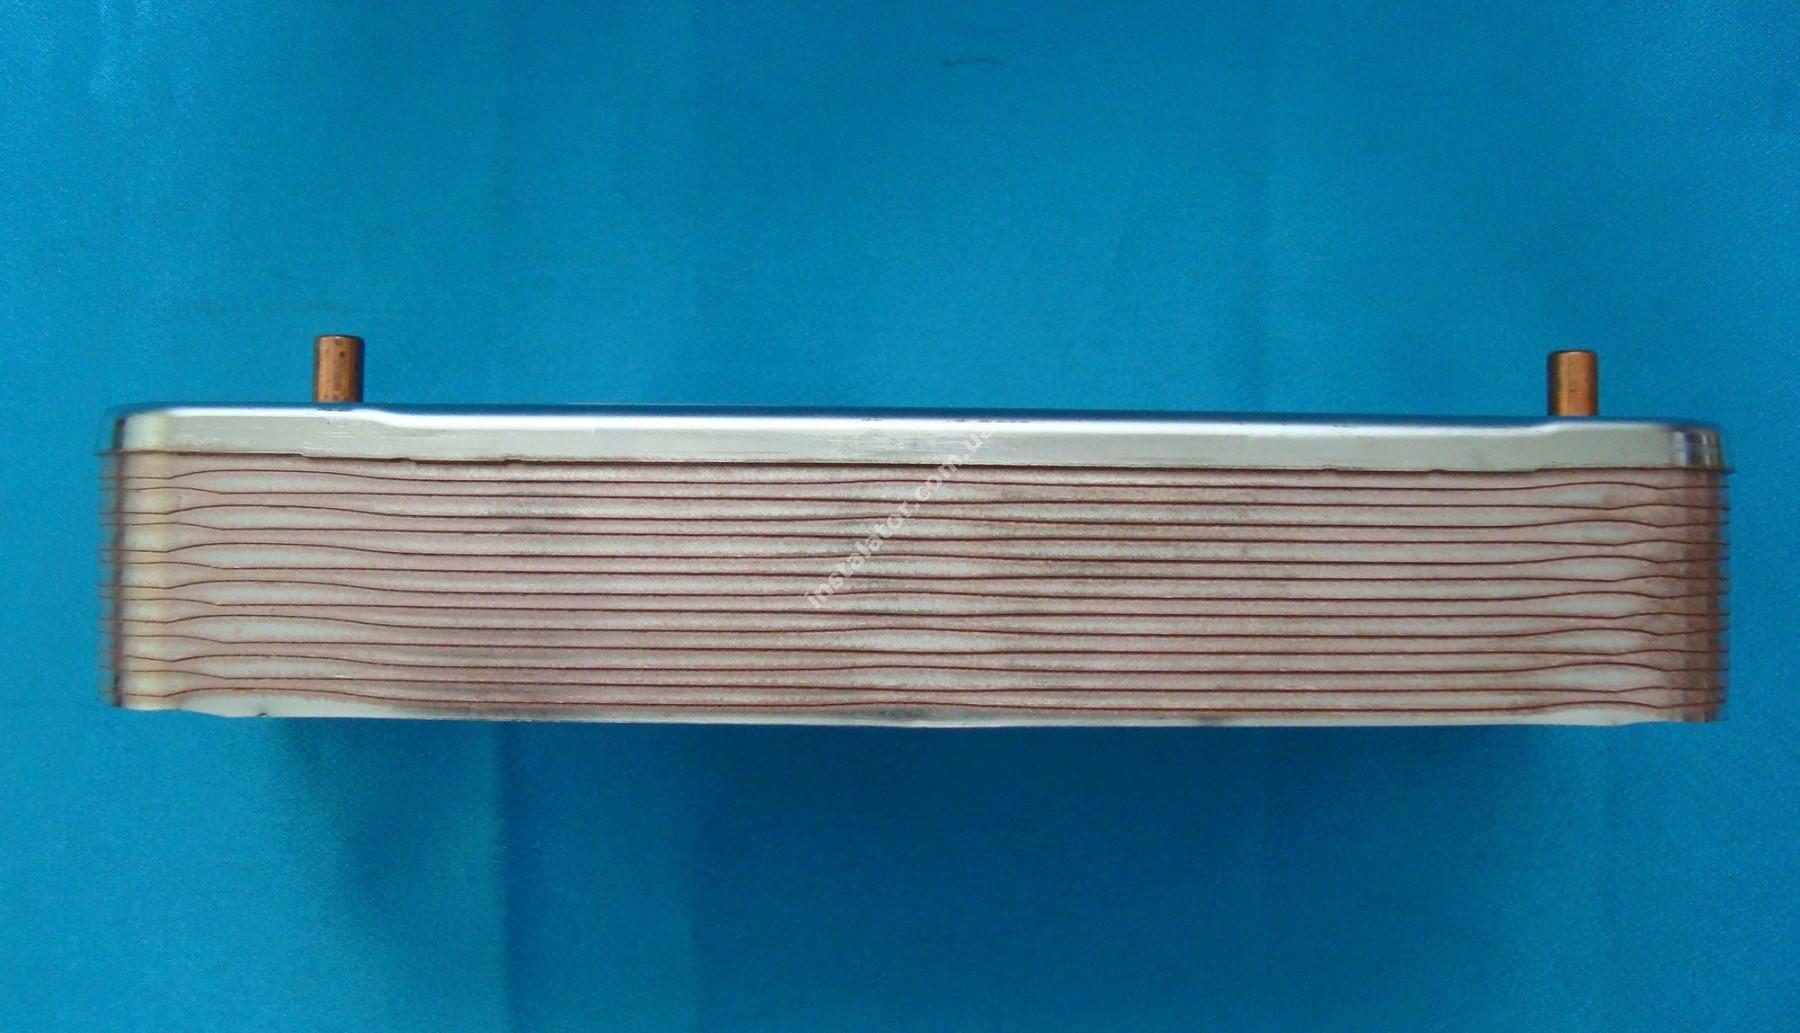 S1005800 Теплообмінник вторинний ГВП SAUNIER DUVAL Themaclassic/ JUNKERS/BOSCH/ALFA LAVAL full-image-0